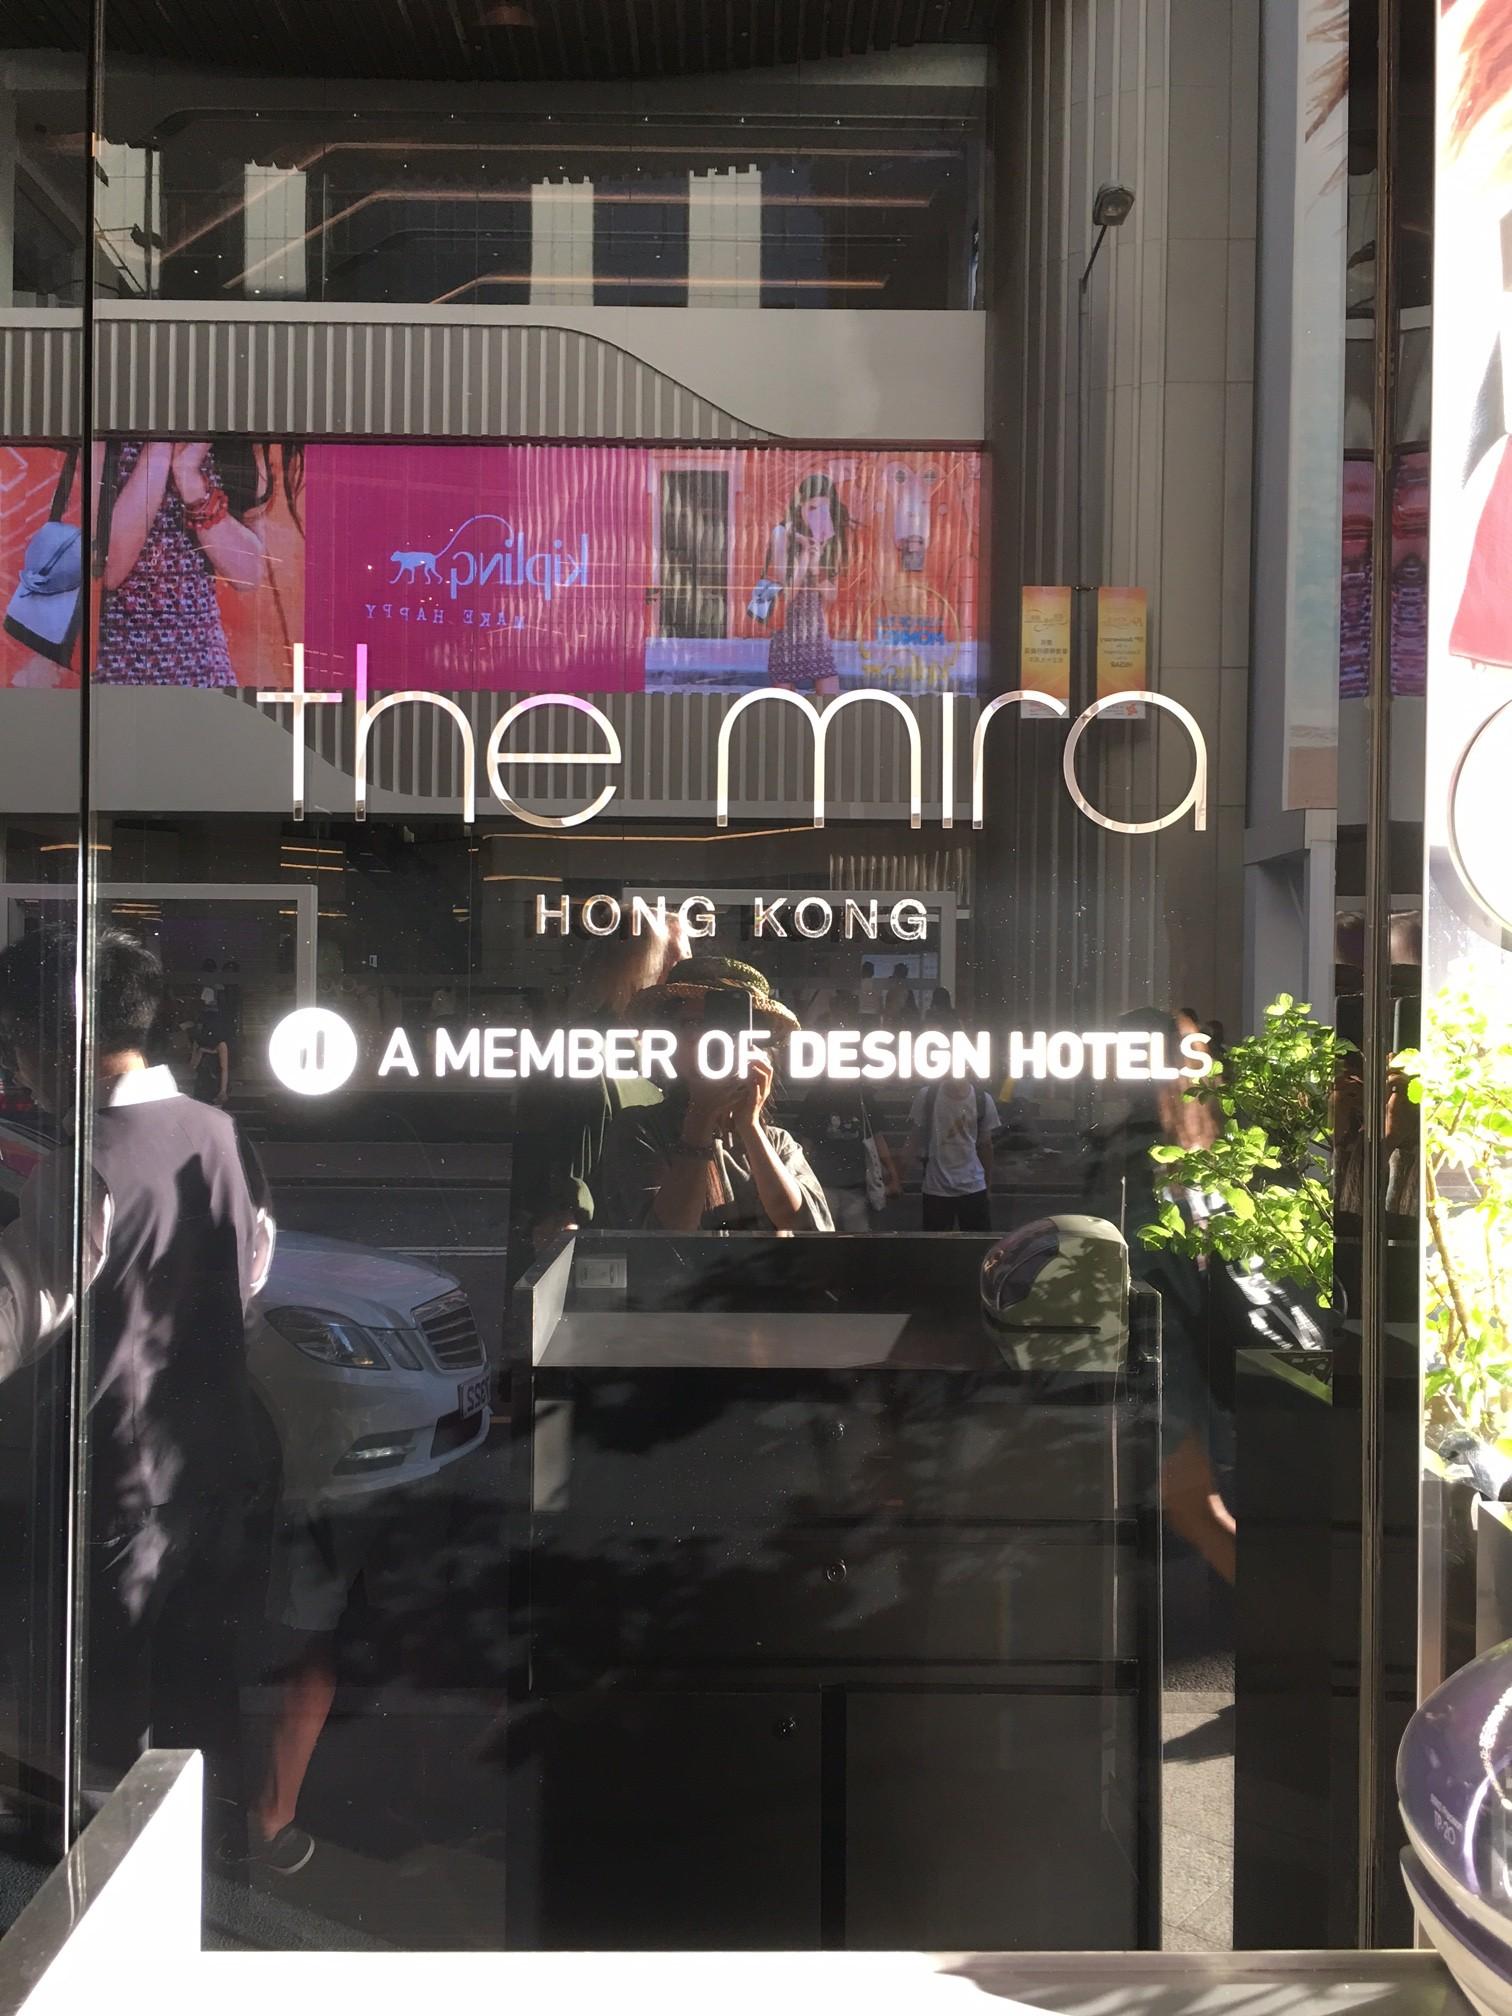 Visiting Mira Hotel Where Edward Snowden Met Glenn Greenwald